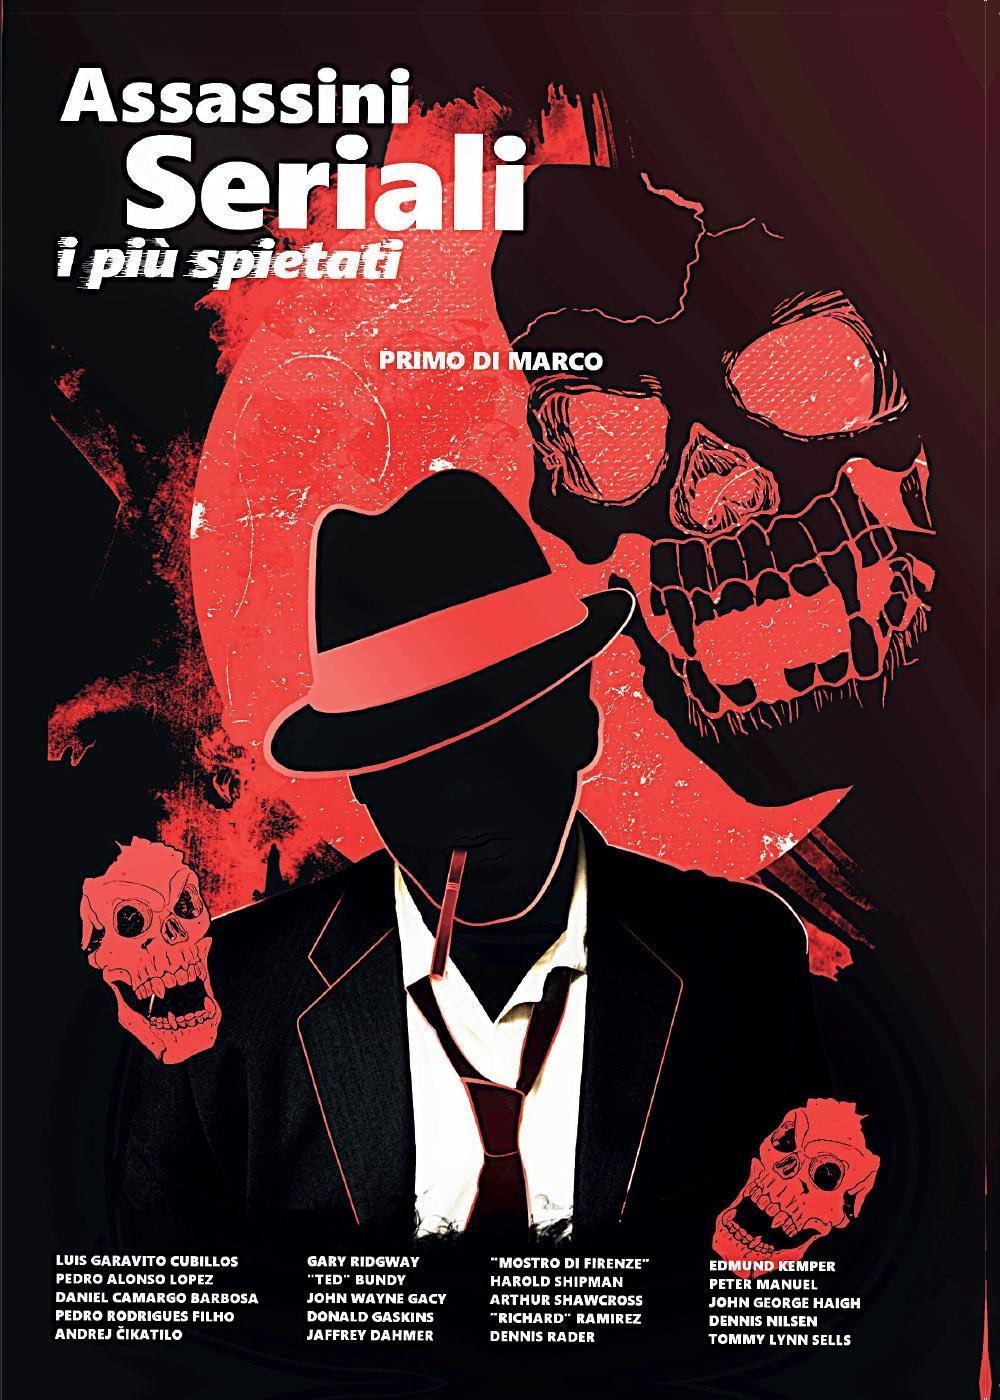 Assassini Seriali: i più spietati